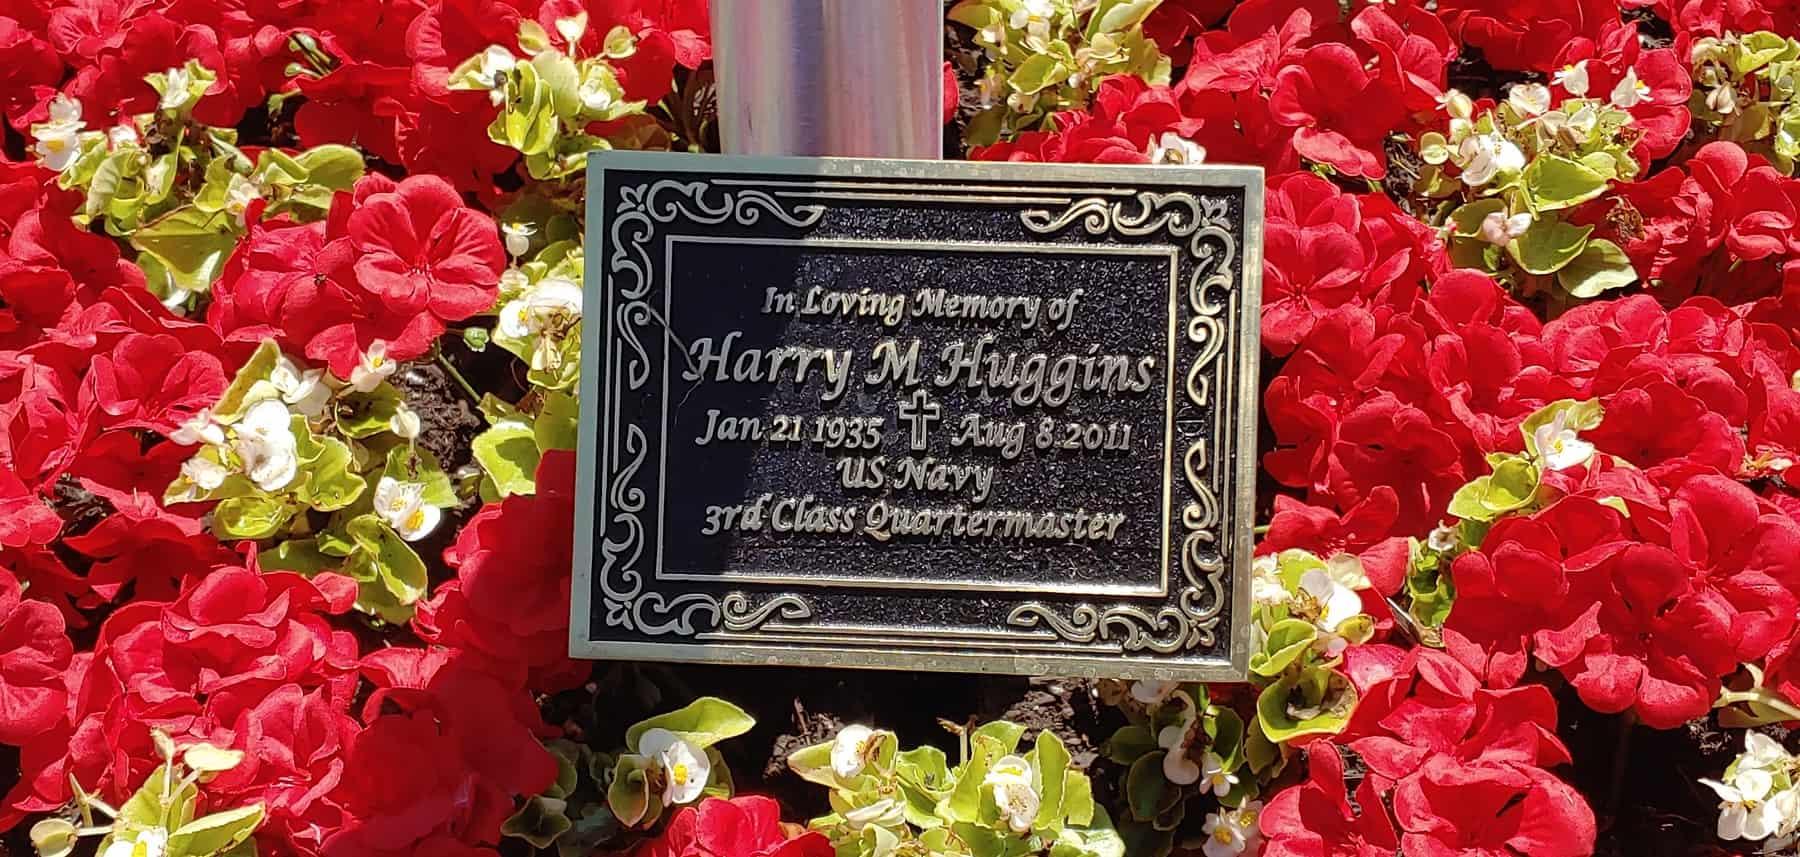 Harry M Huggins Plaque Dedication